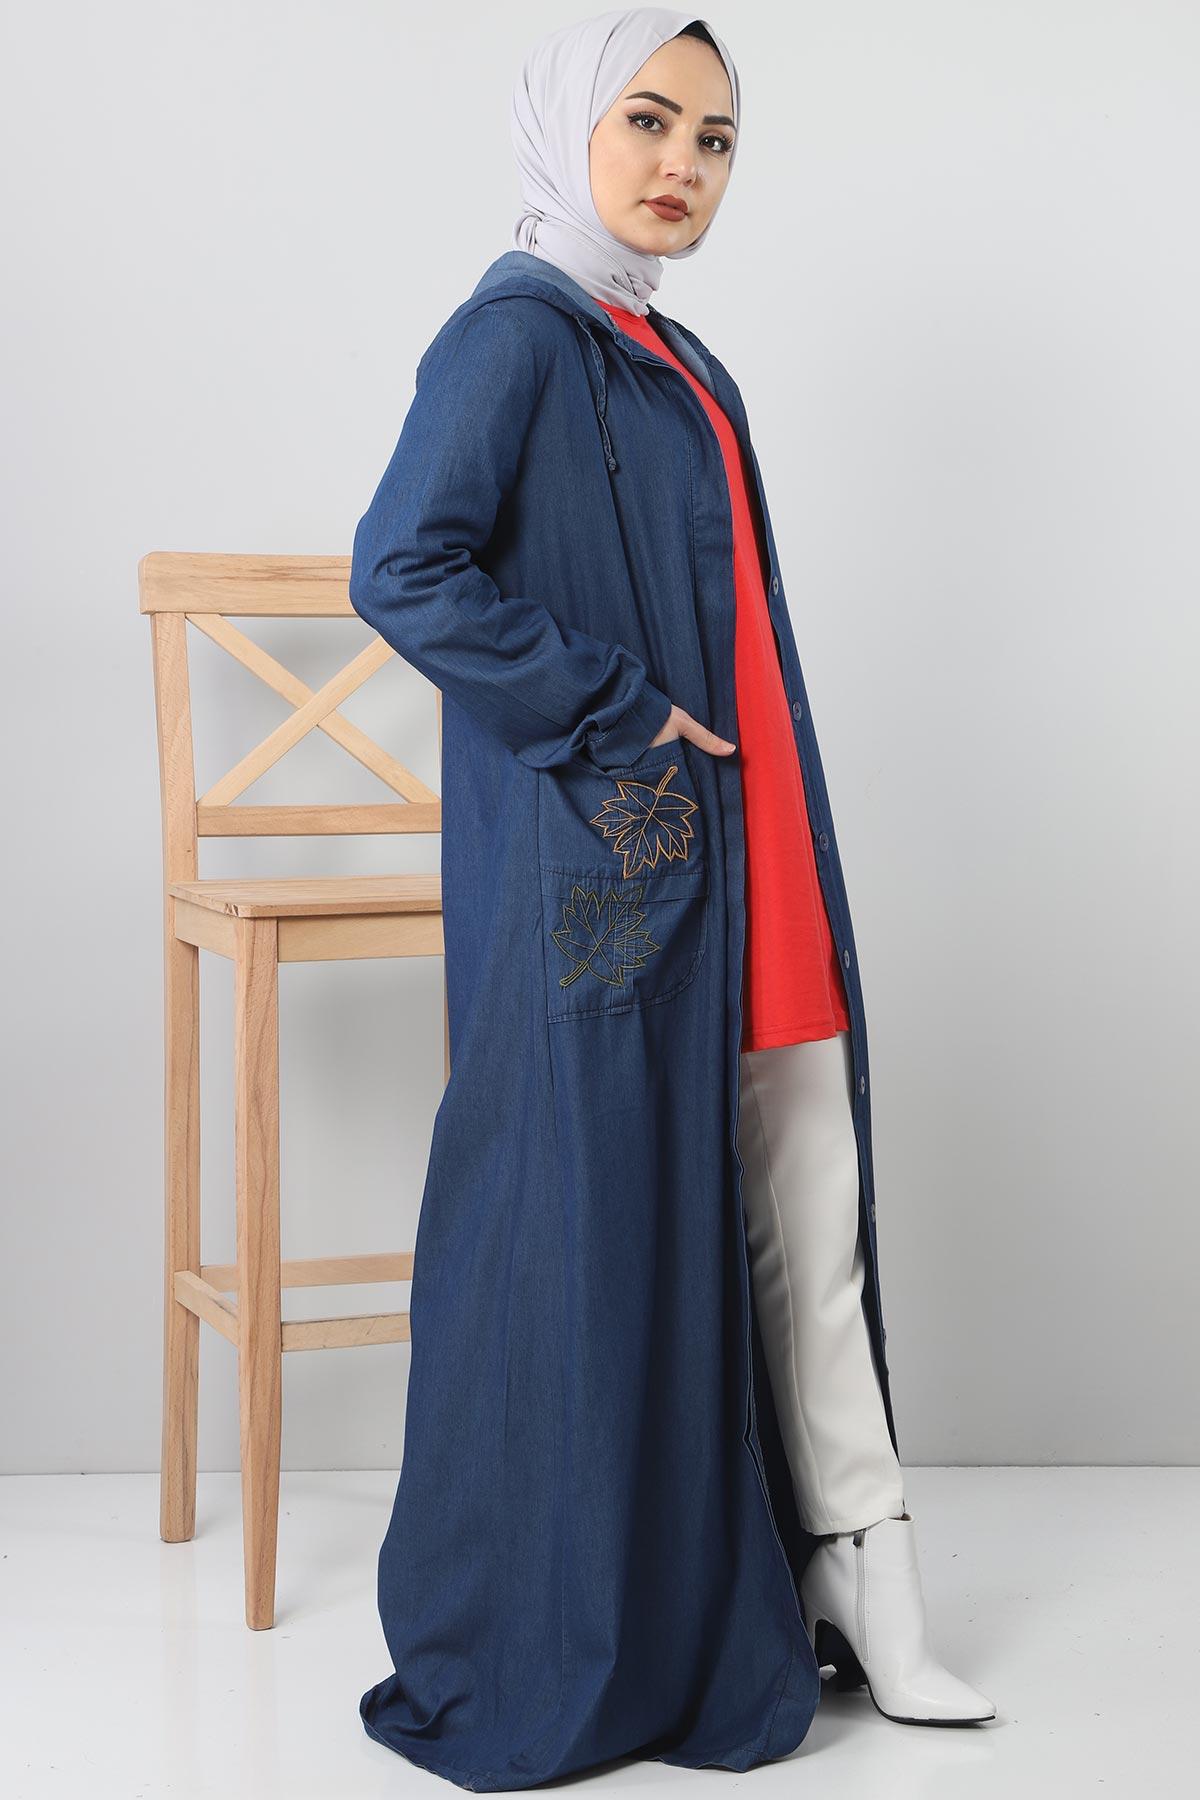 Embroidered Pocket Jeans Cap TSD 1131 Dark Blue